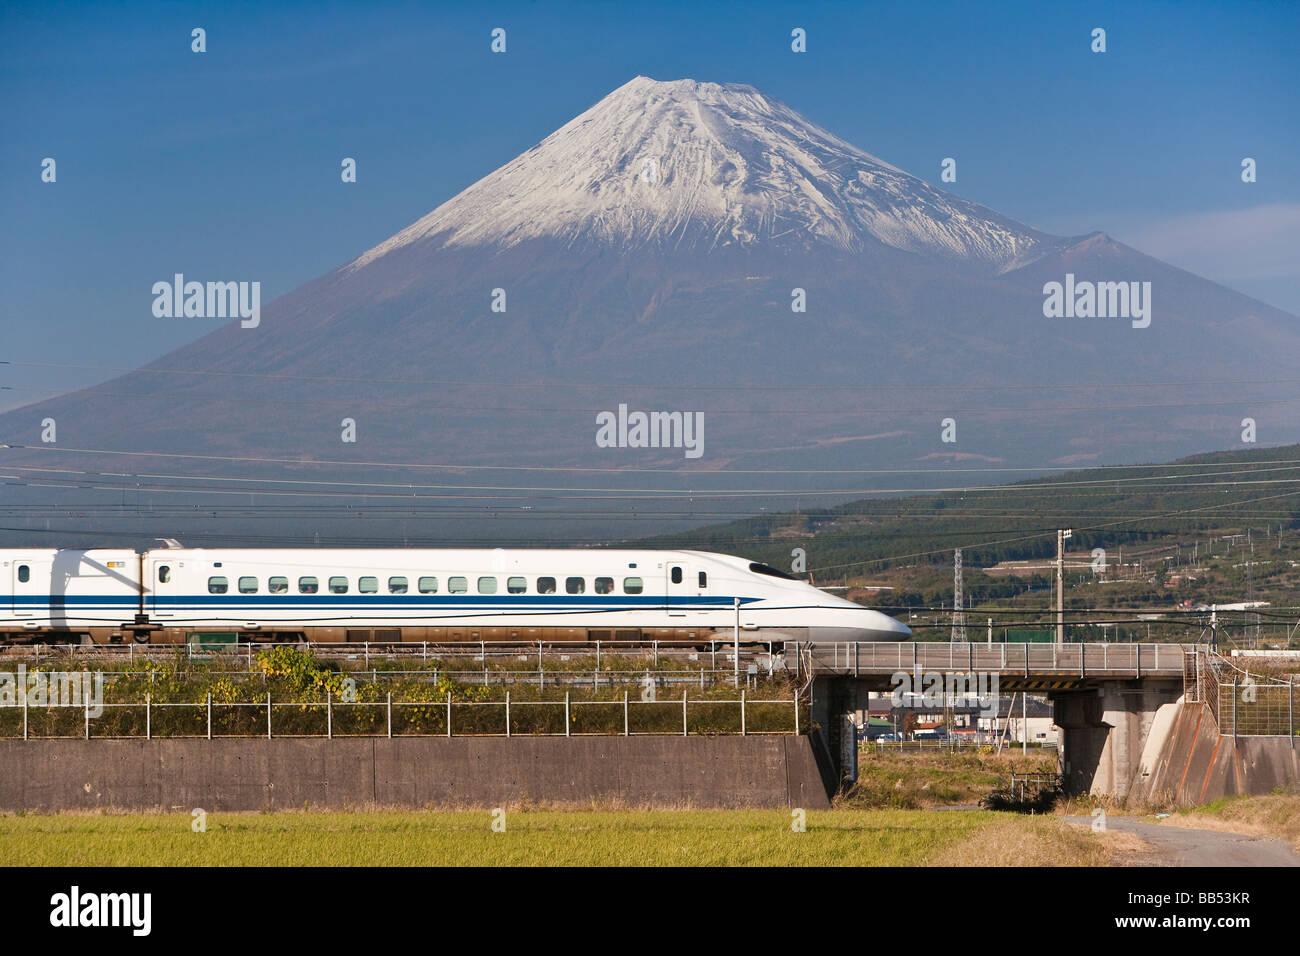 Shinkansen Japanese Bullet Train And Mount Fuji Houshu